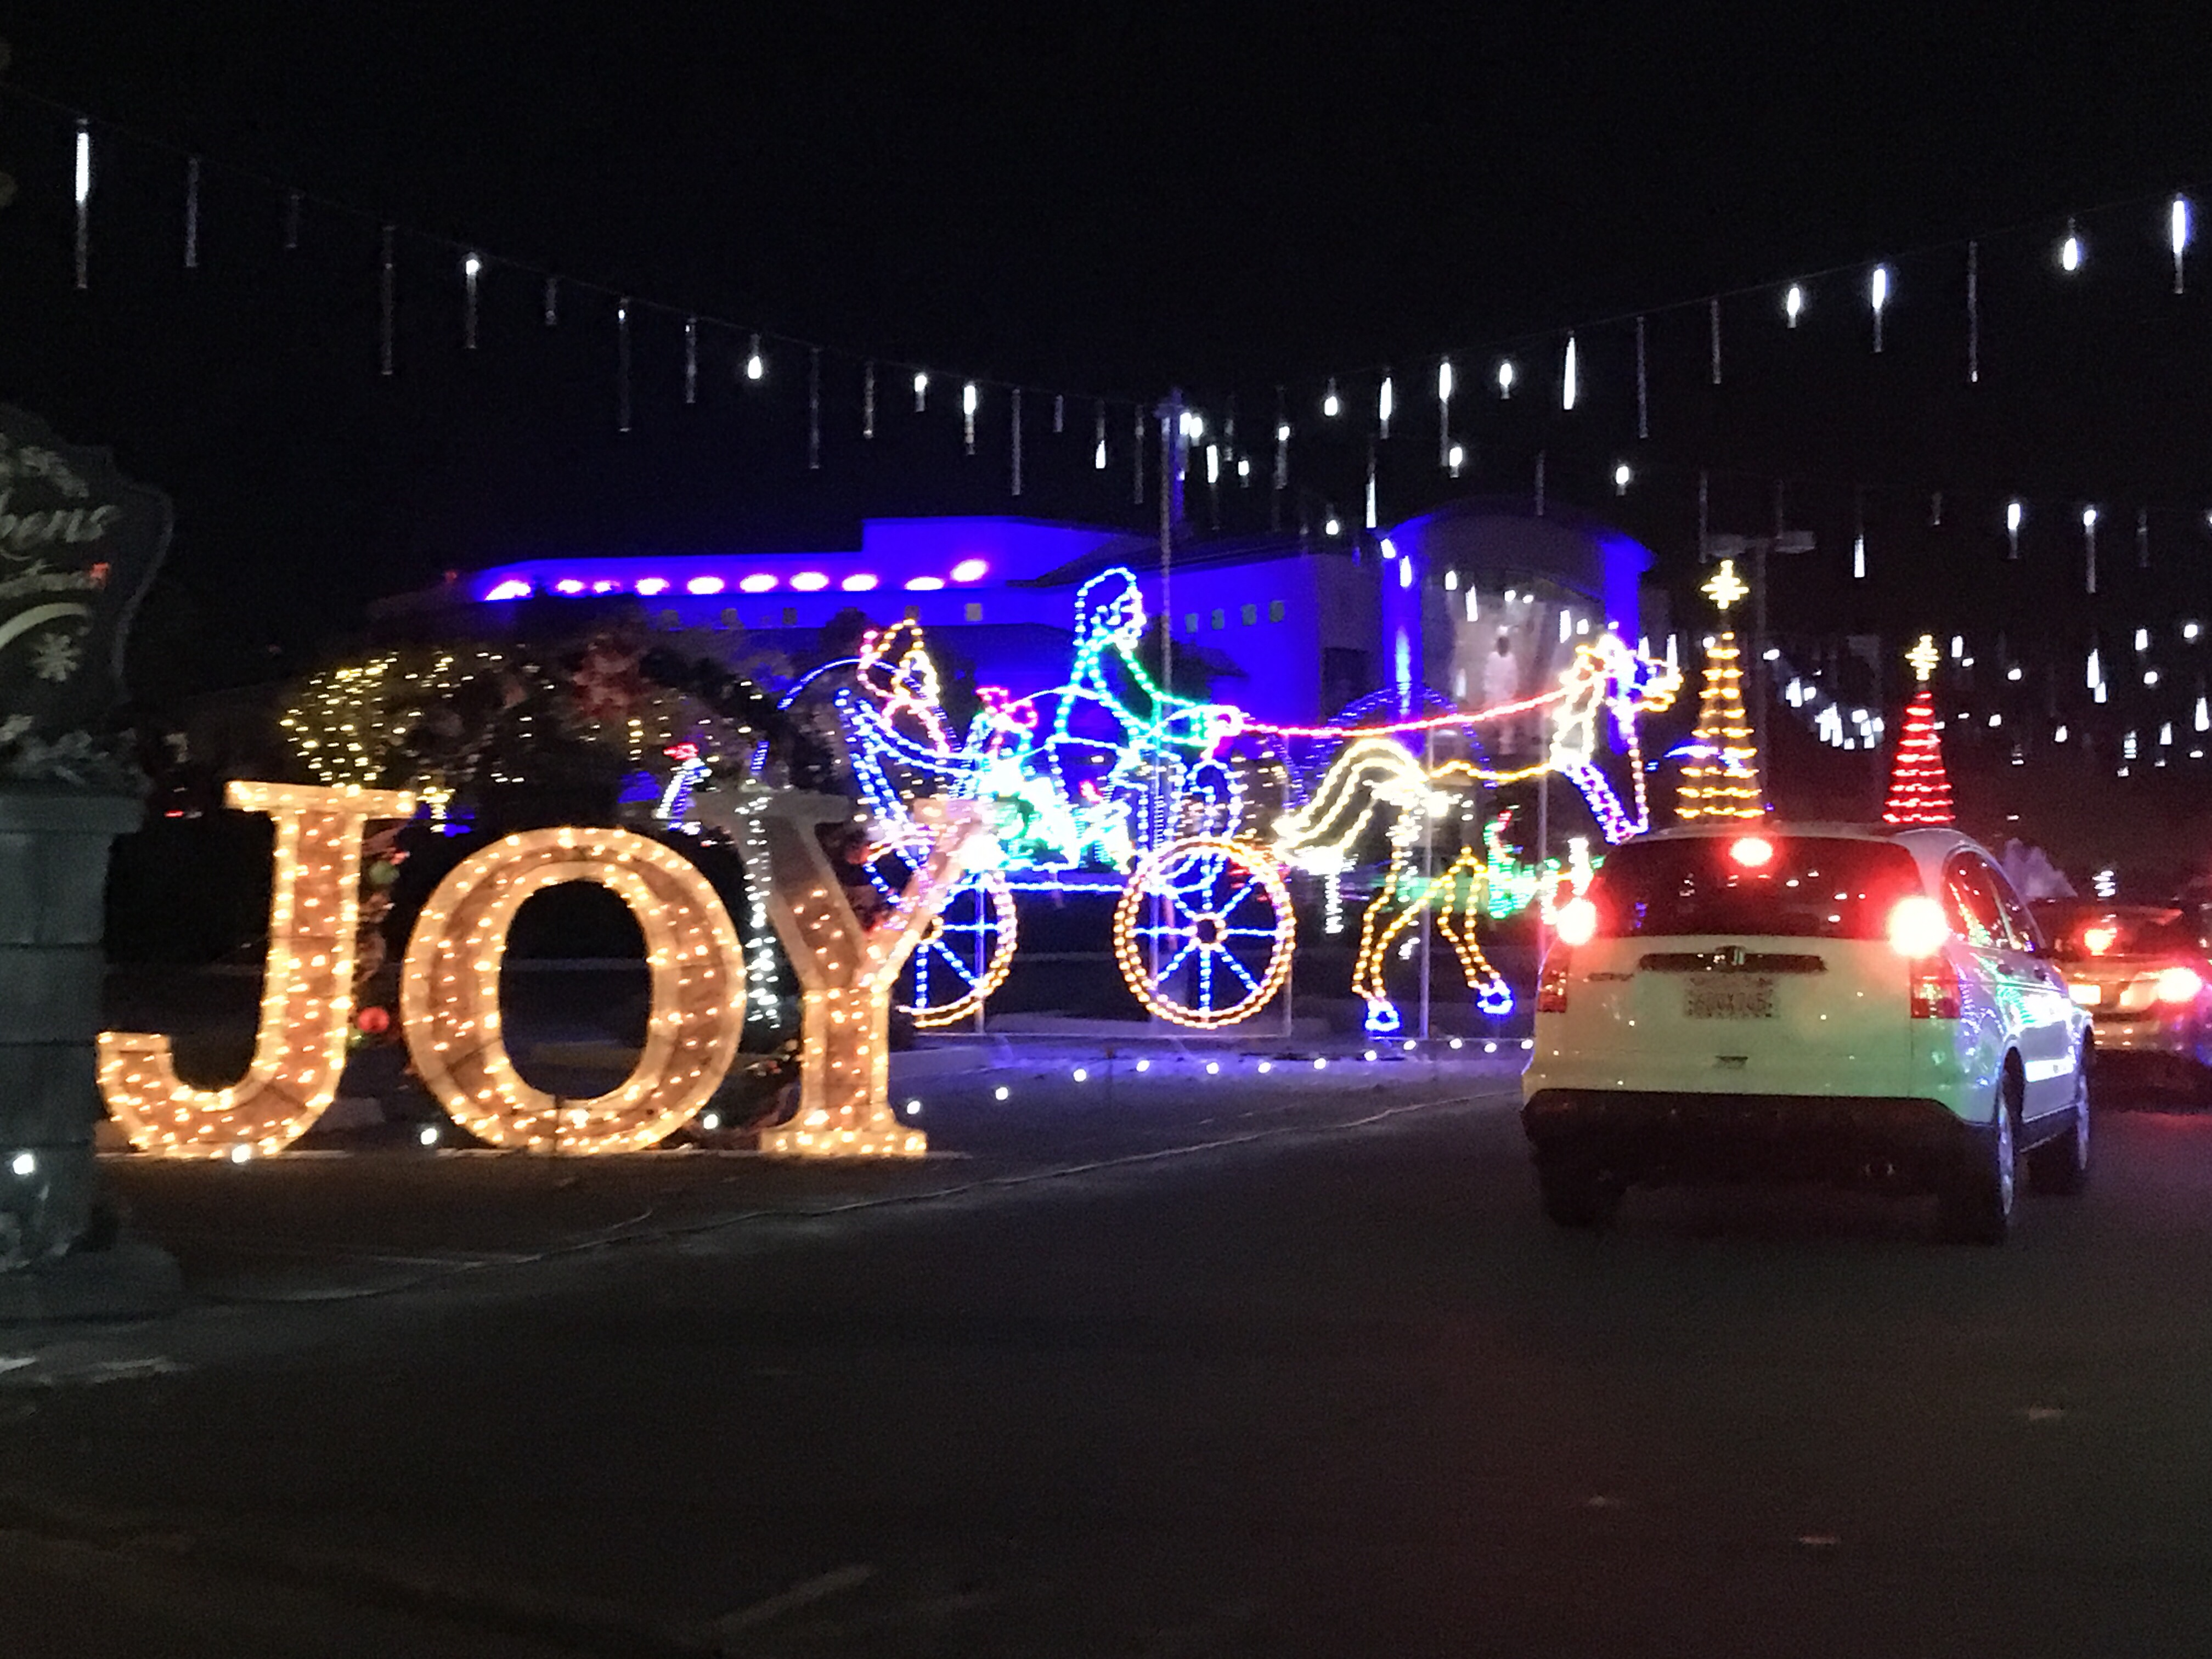 Drive Through Christmas Lights.Adventure Christmas Lights Drive Thru This Mom Is Going Places